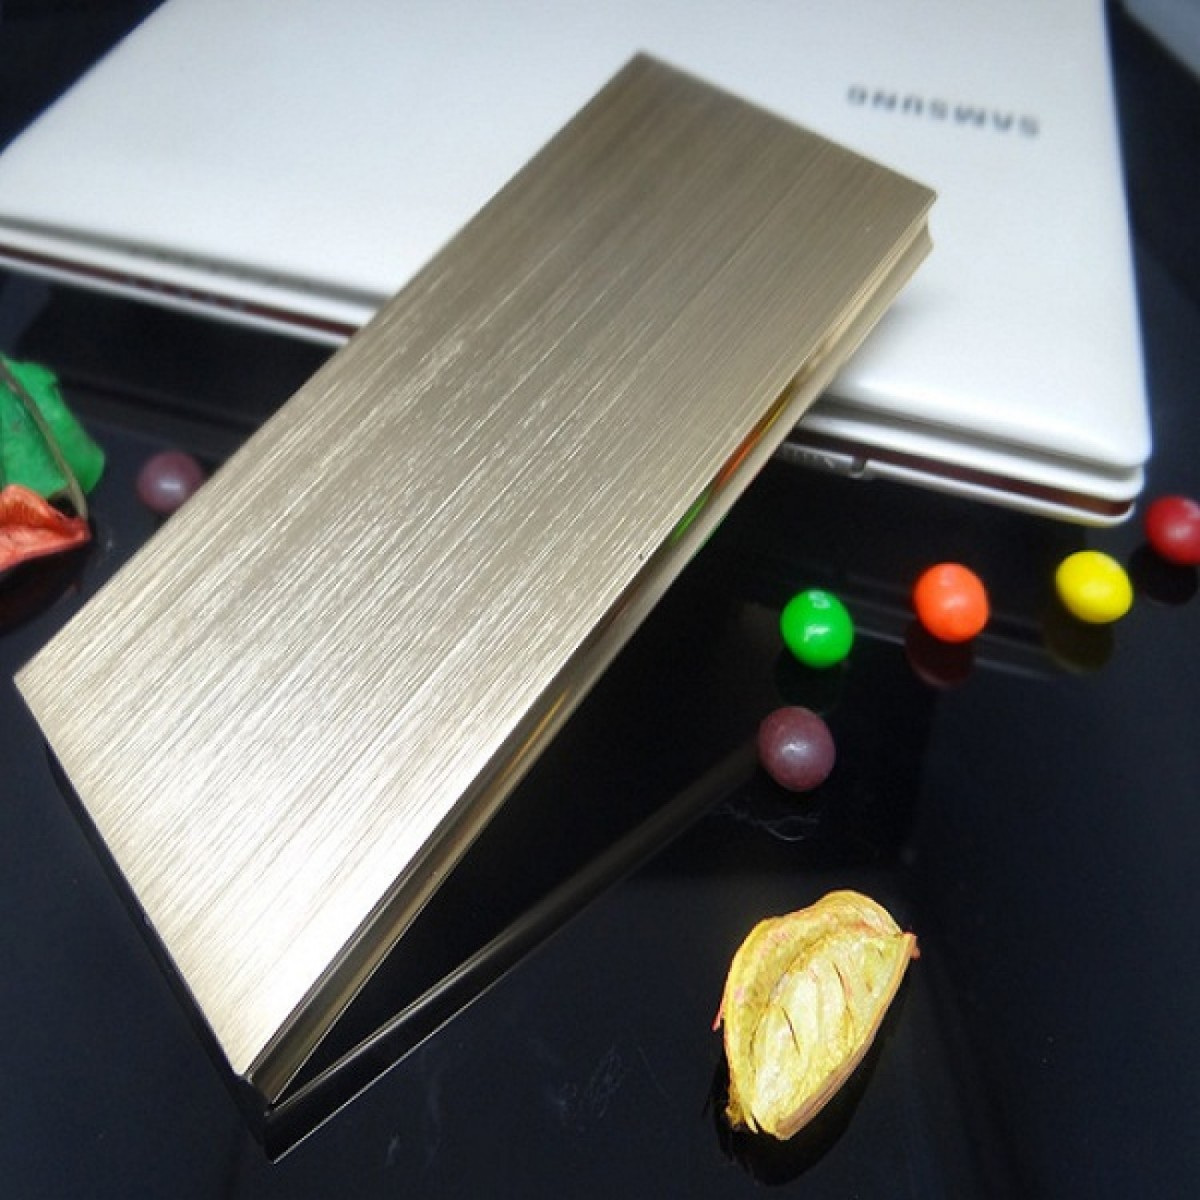 Externí baterie POWER BANK 20 000mAh, 3x USB, LED - Zlatá